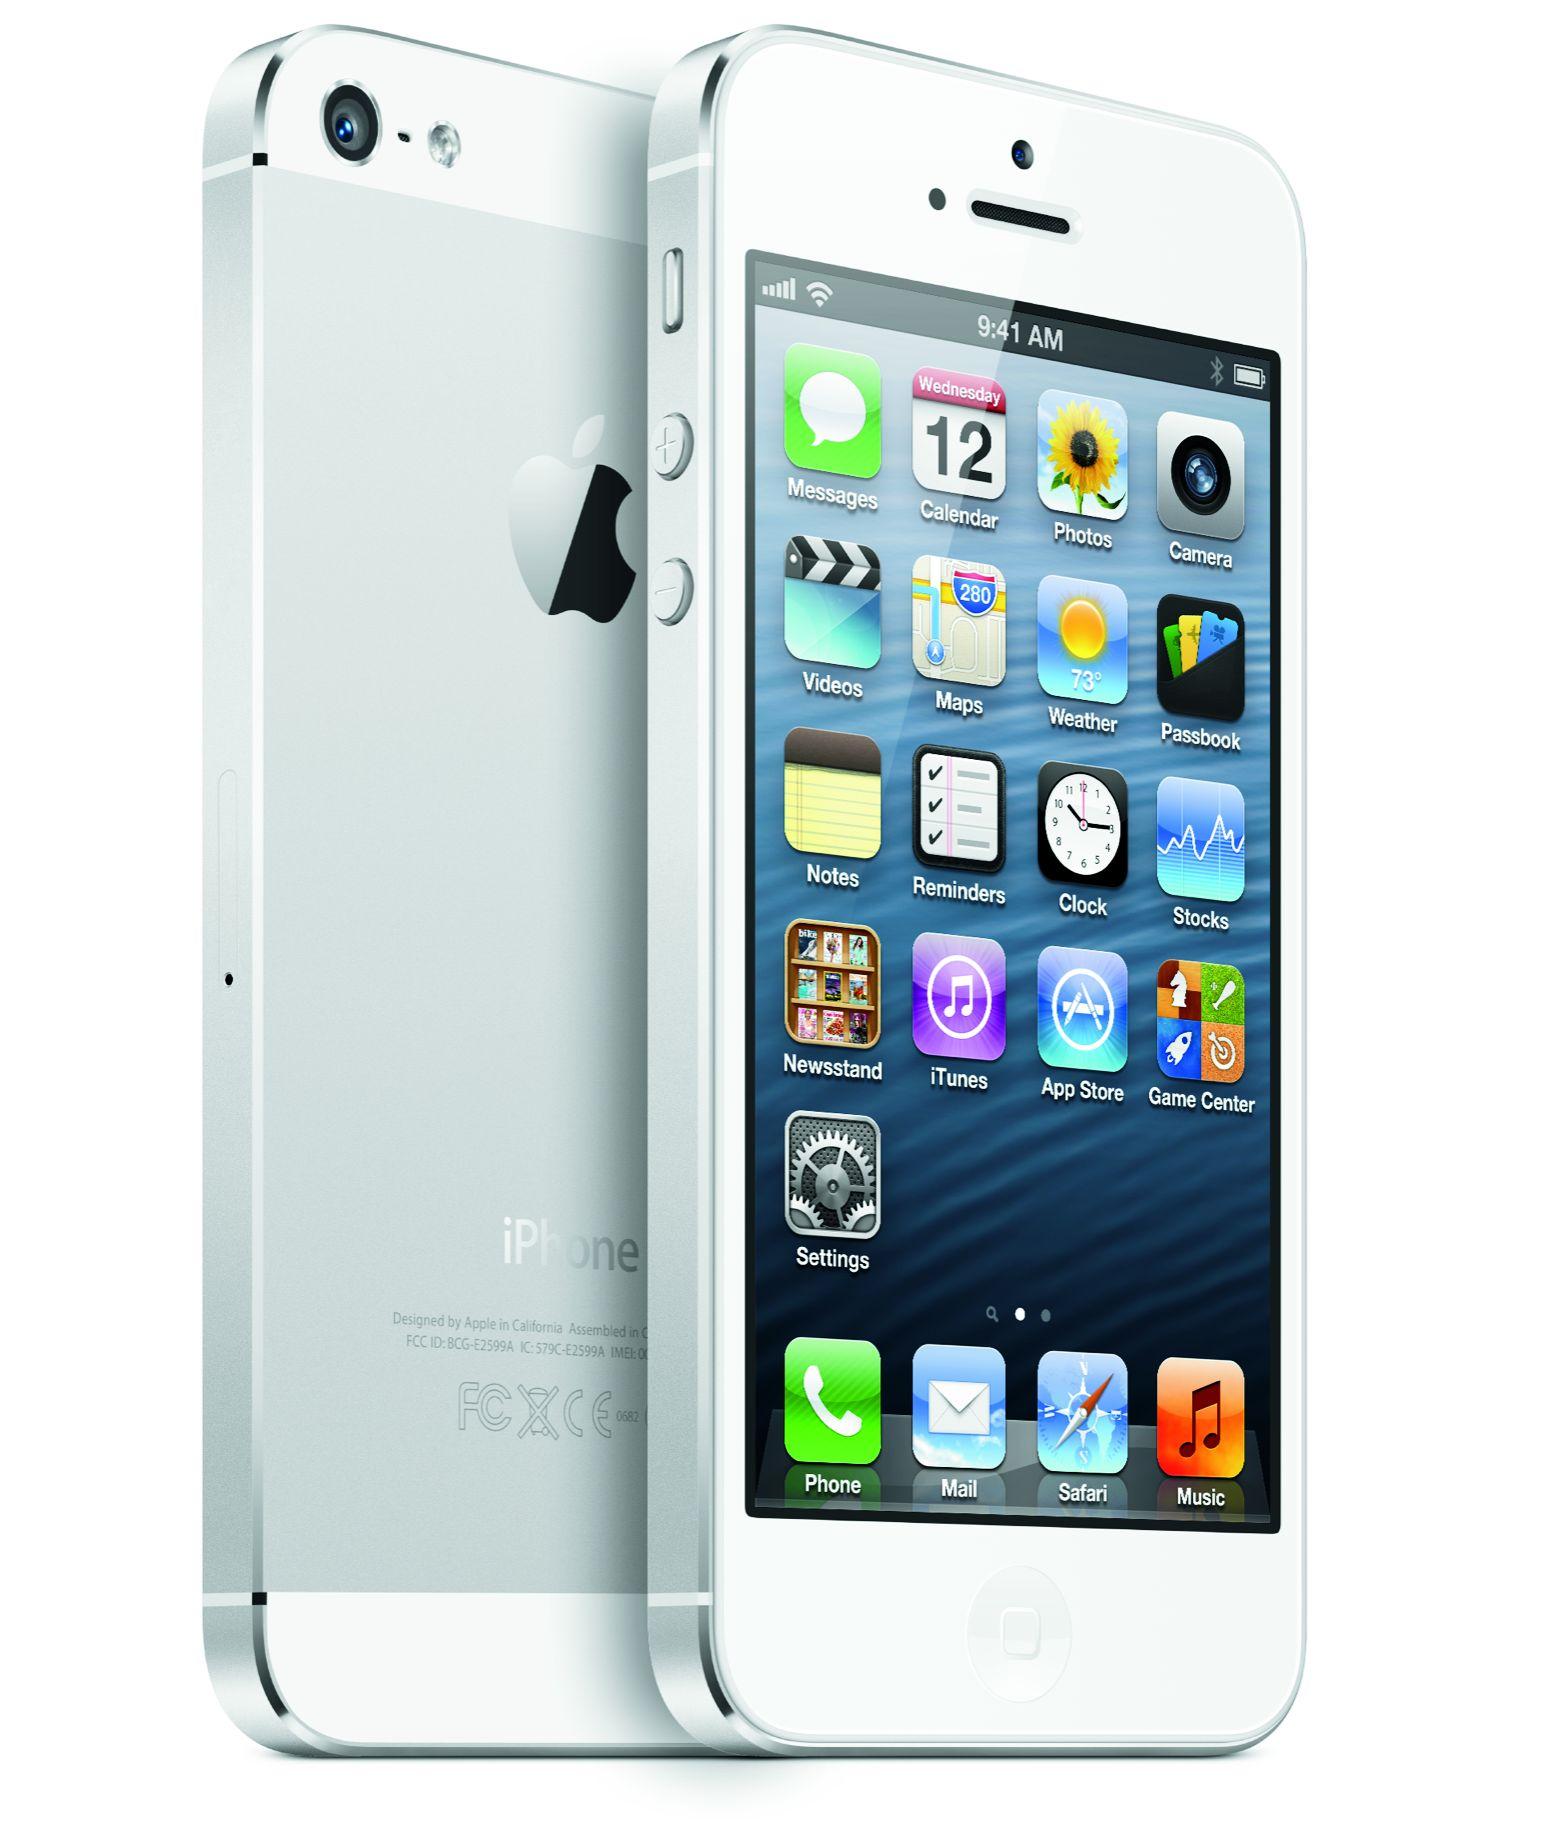 Apple iPhone 5 inspiratie iPad Pro